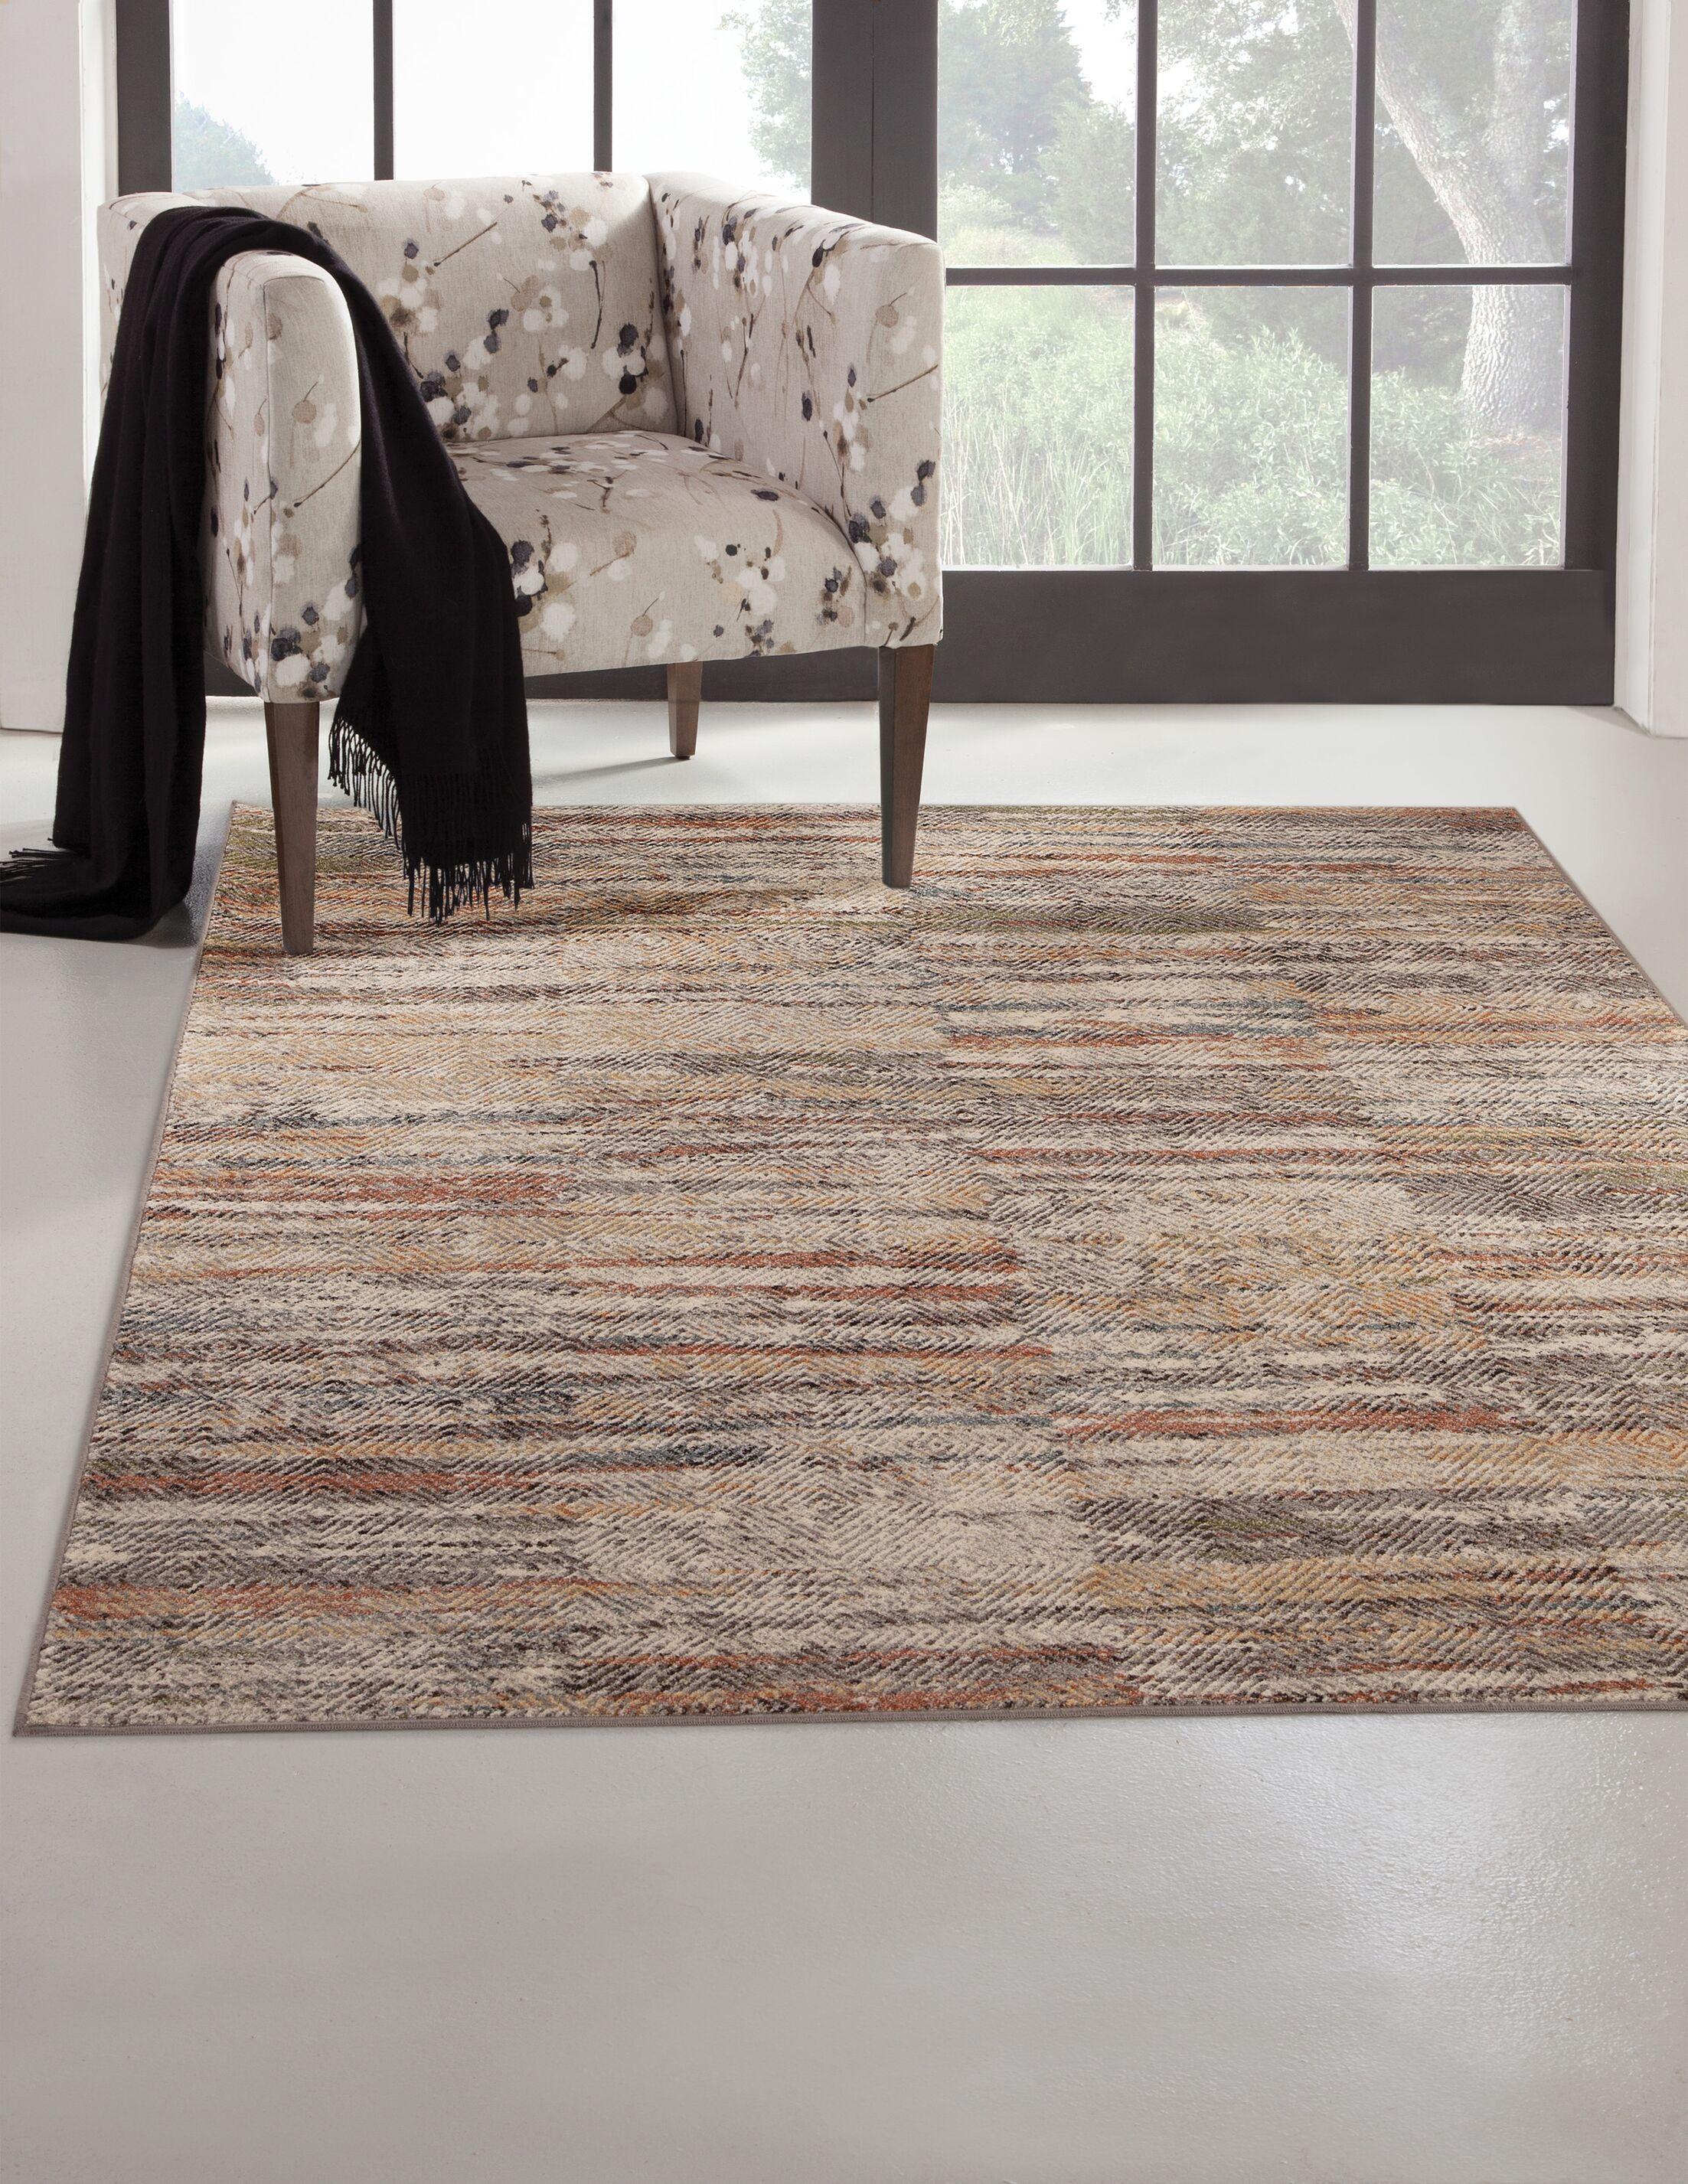 Bryzel Ivory/Gray Area Rug Rug Size: Rectangle 5' x 8'